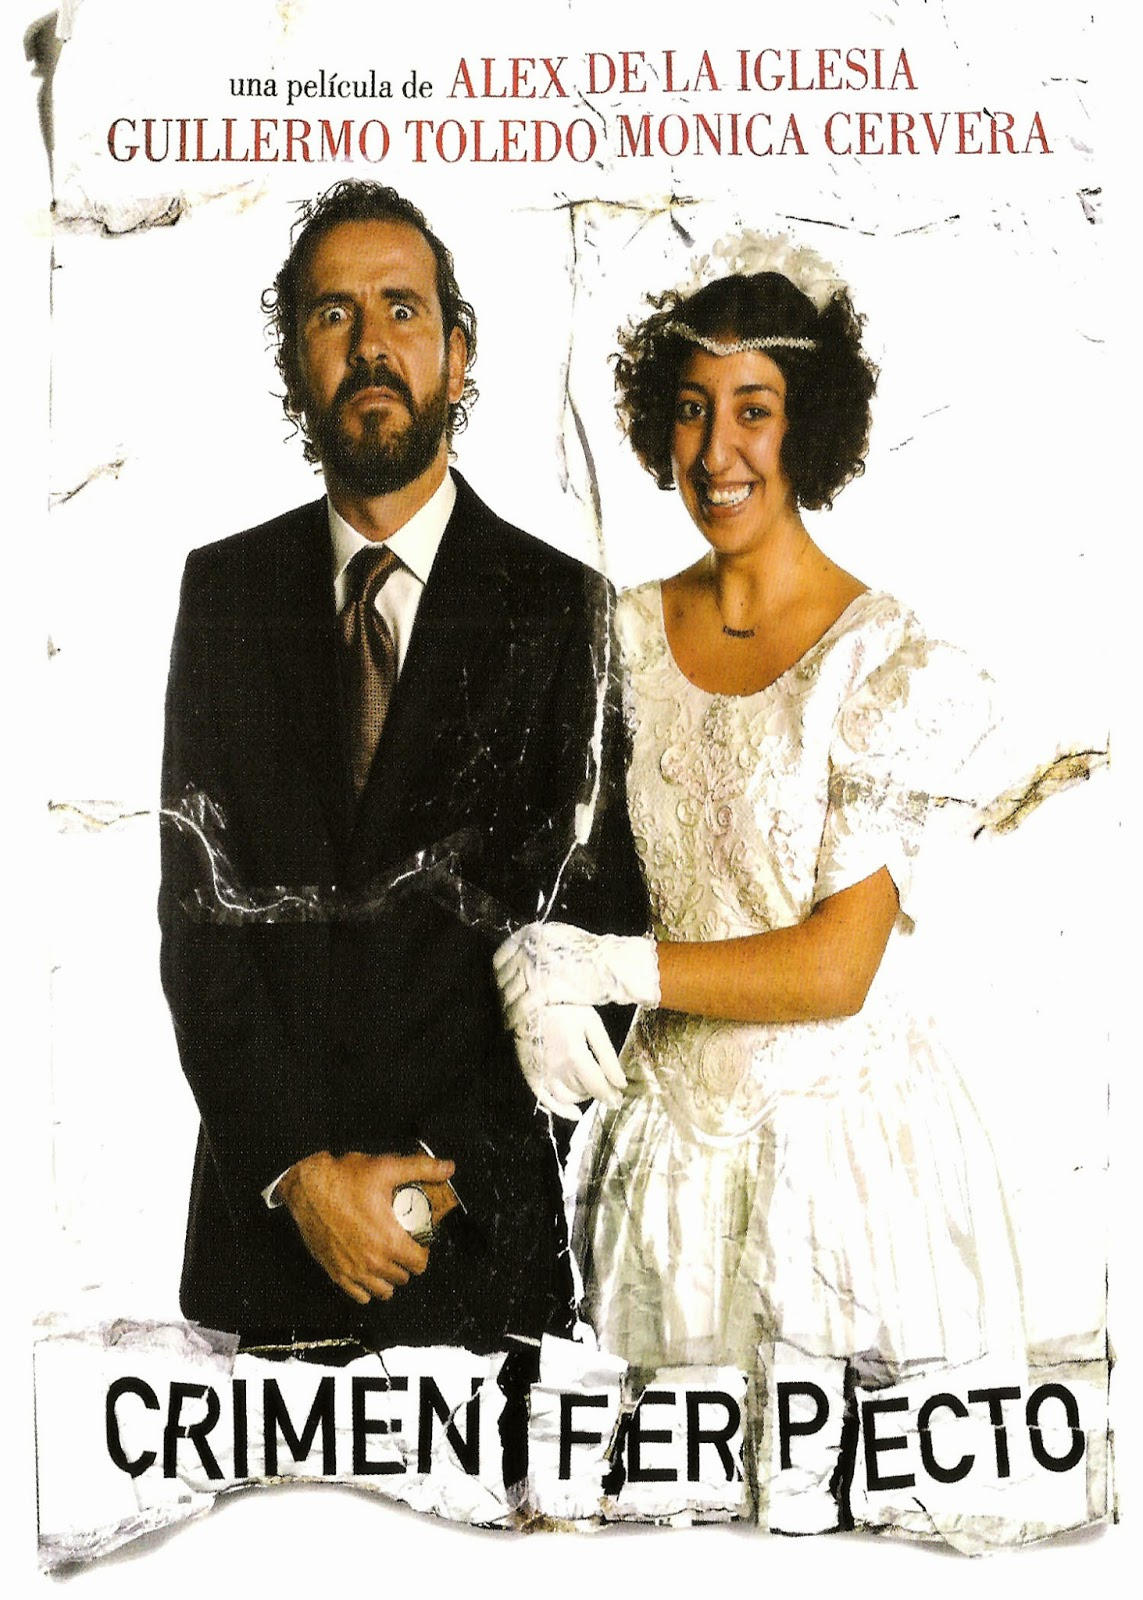 Crimen Ferpecto (2004) Comedia